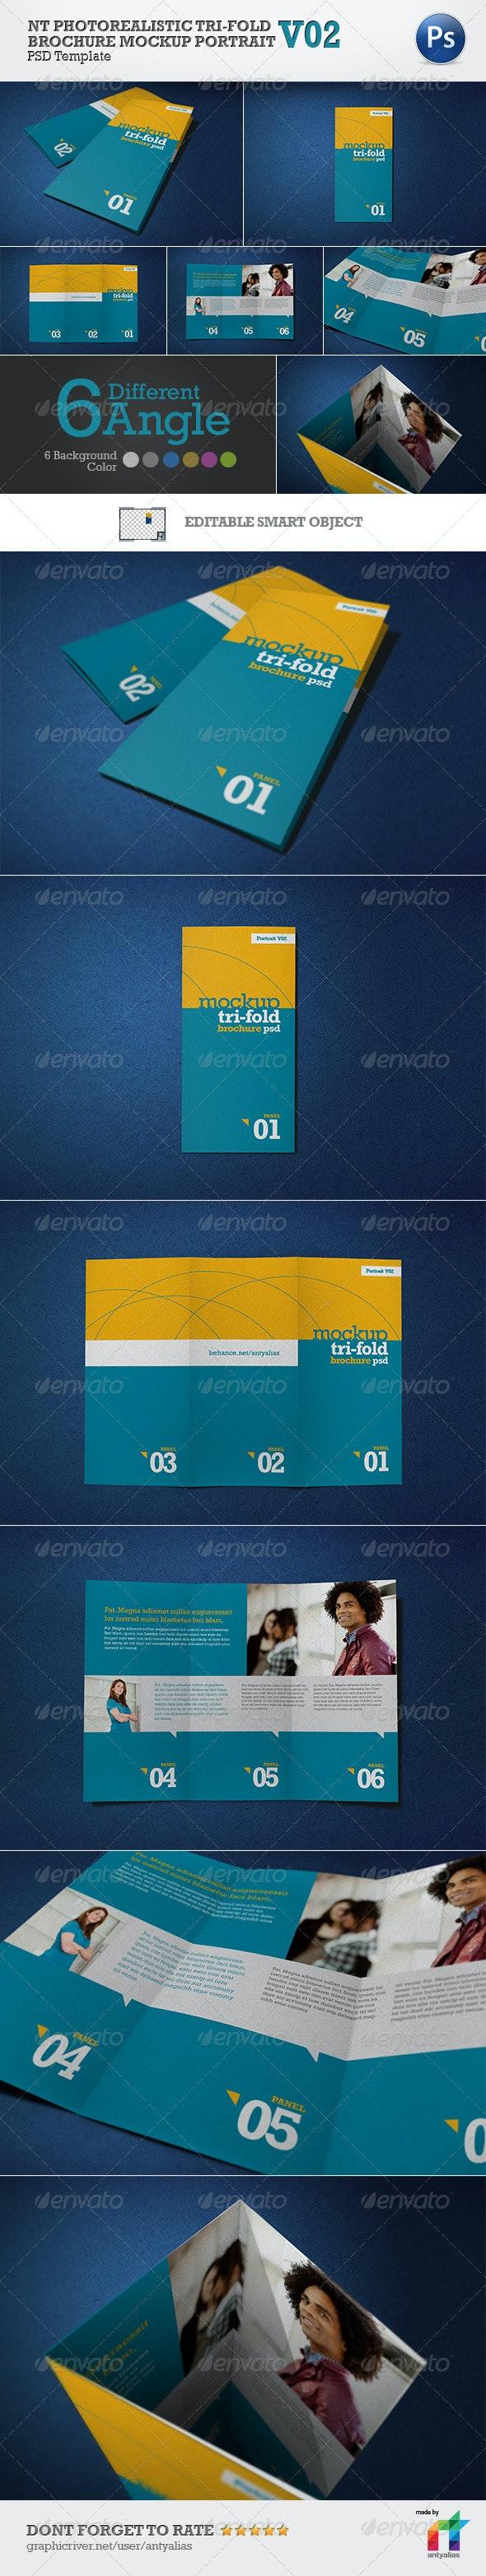 NT Photorealistic Tri-Fold Brochure Mockup - V02 - Print Product Mock-Ups